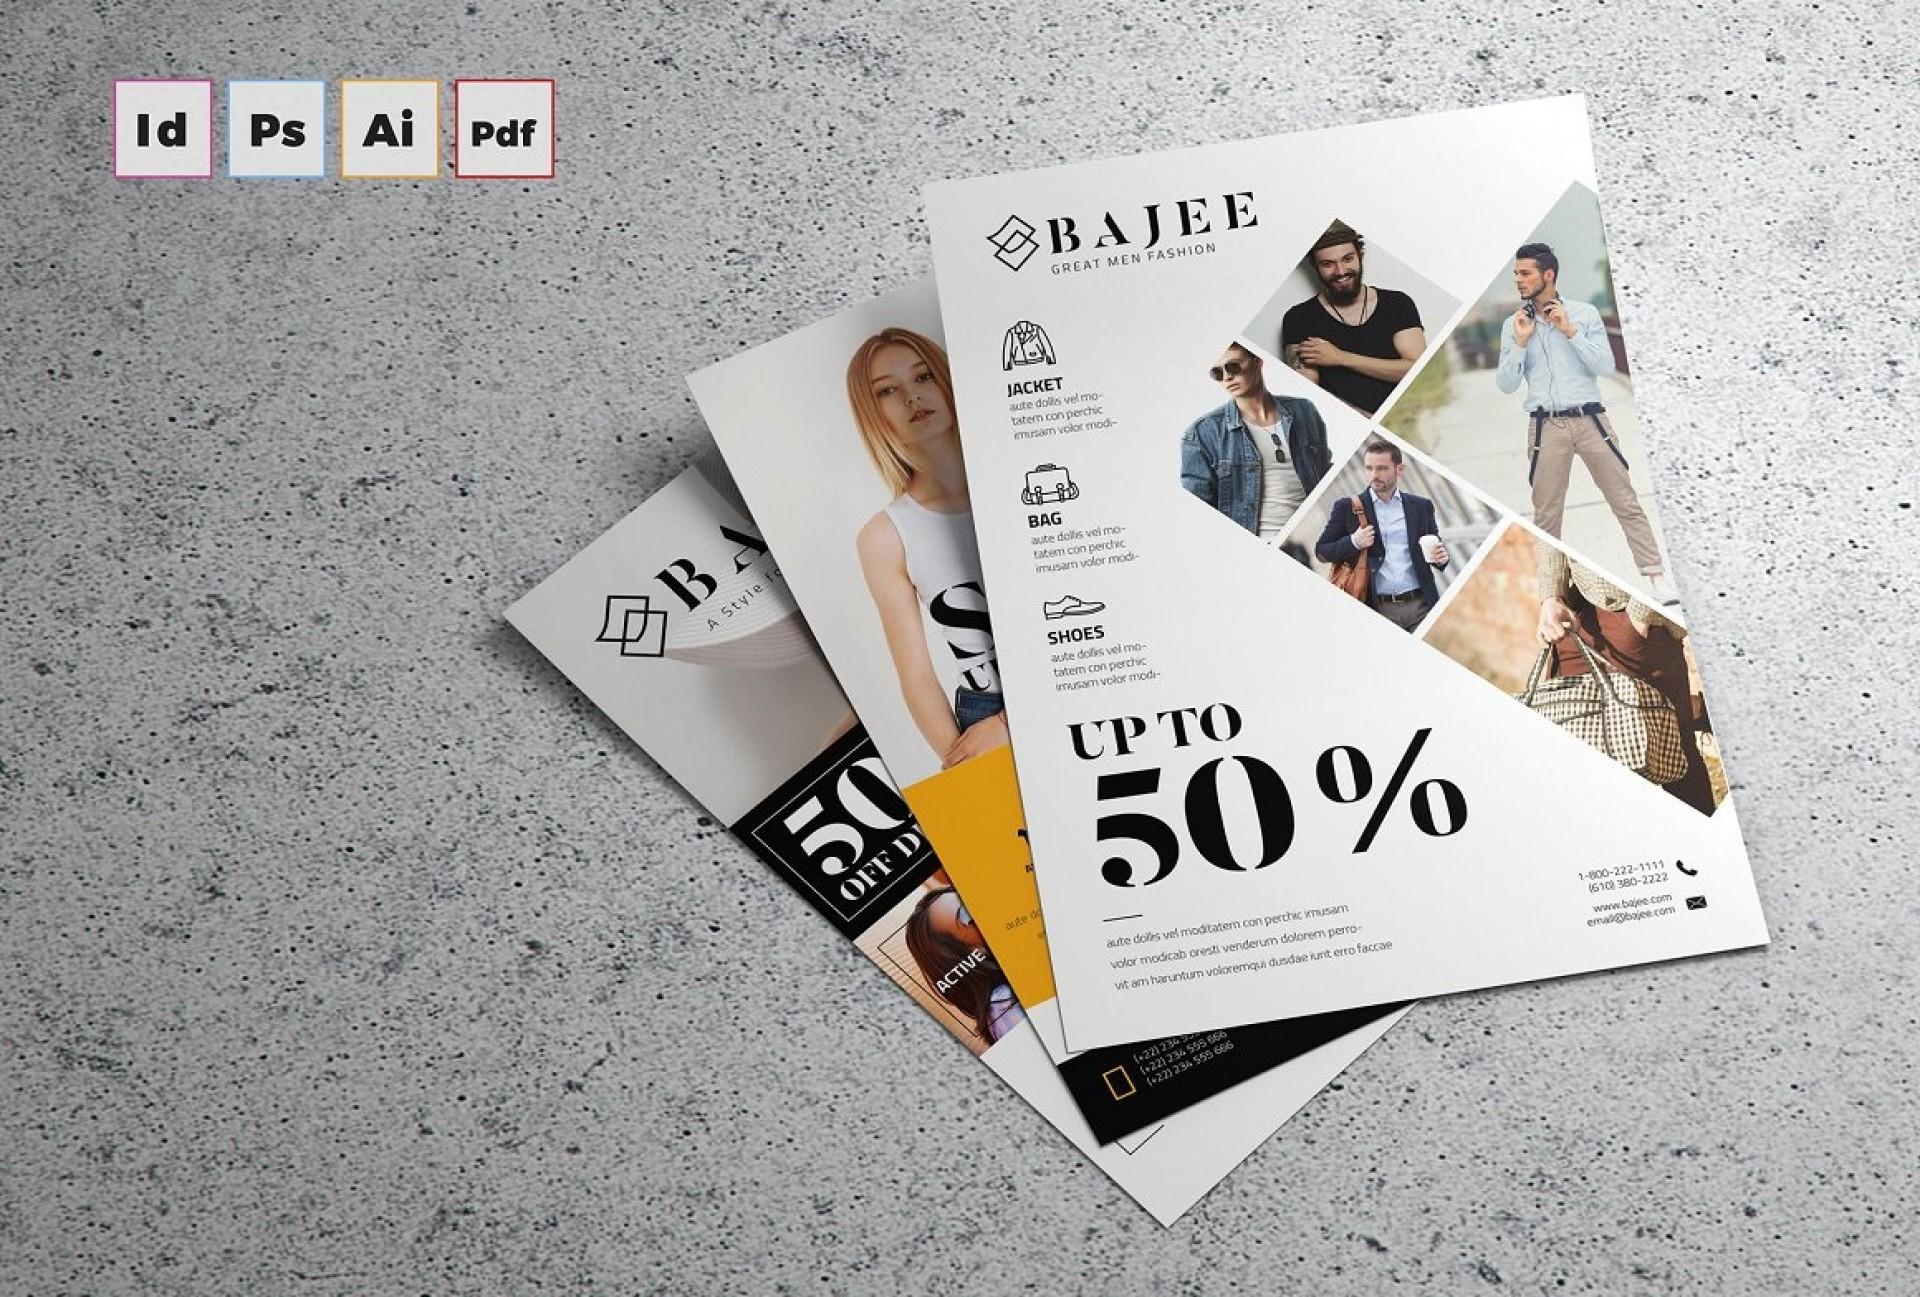 006 Fascinating In Design Flyer Template Inspiration  Indesign Free Adobe Download1920